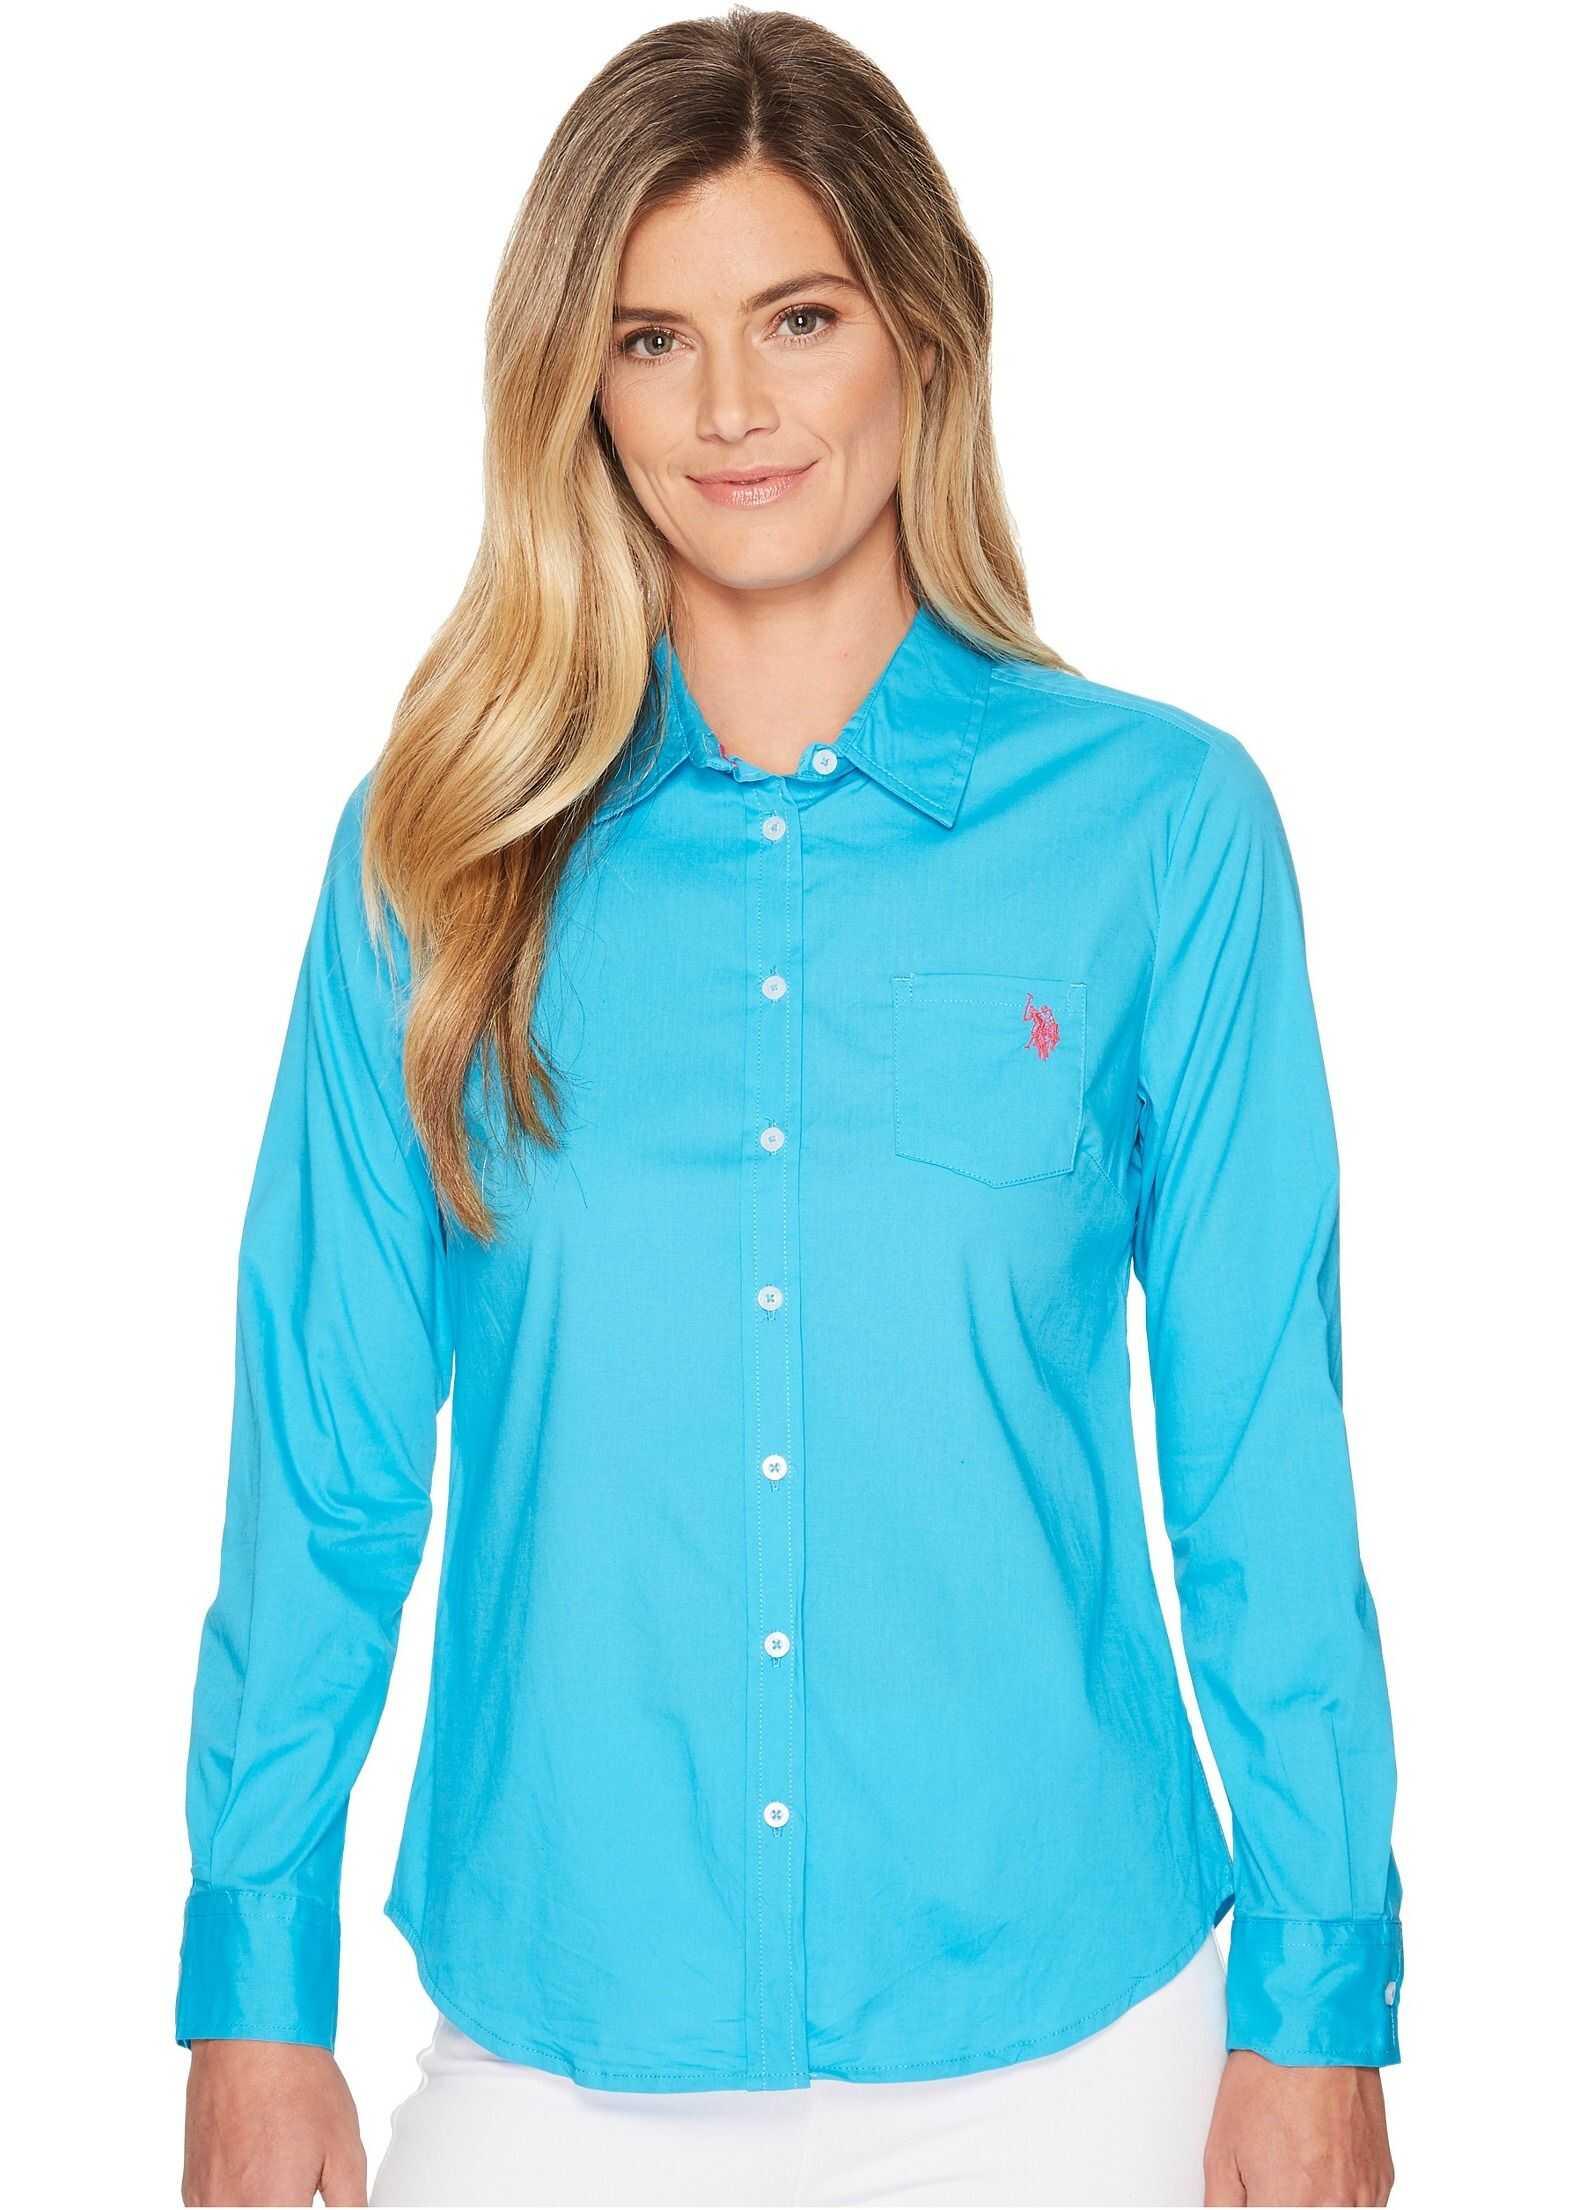 U.S. POLO ASSN. Solid Single Pocket Long Sleeve Shirt Surf Blue